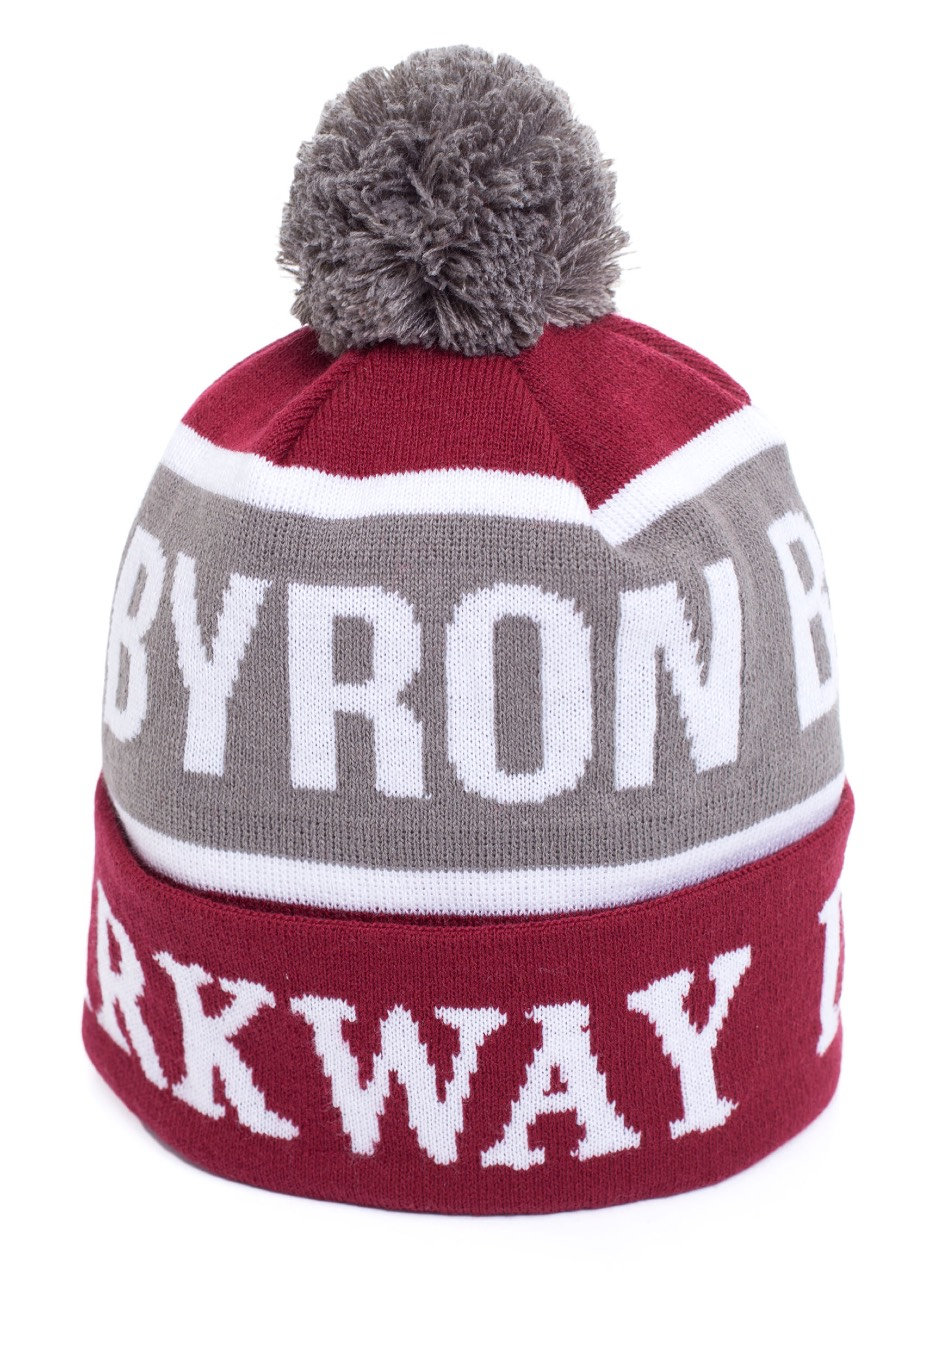 cf7d751ba4f Parkway Drive - Byron Bay Burgundy Pom - Beanie - Impericon.com UK